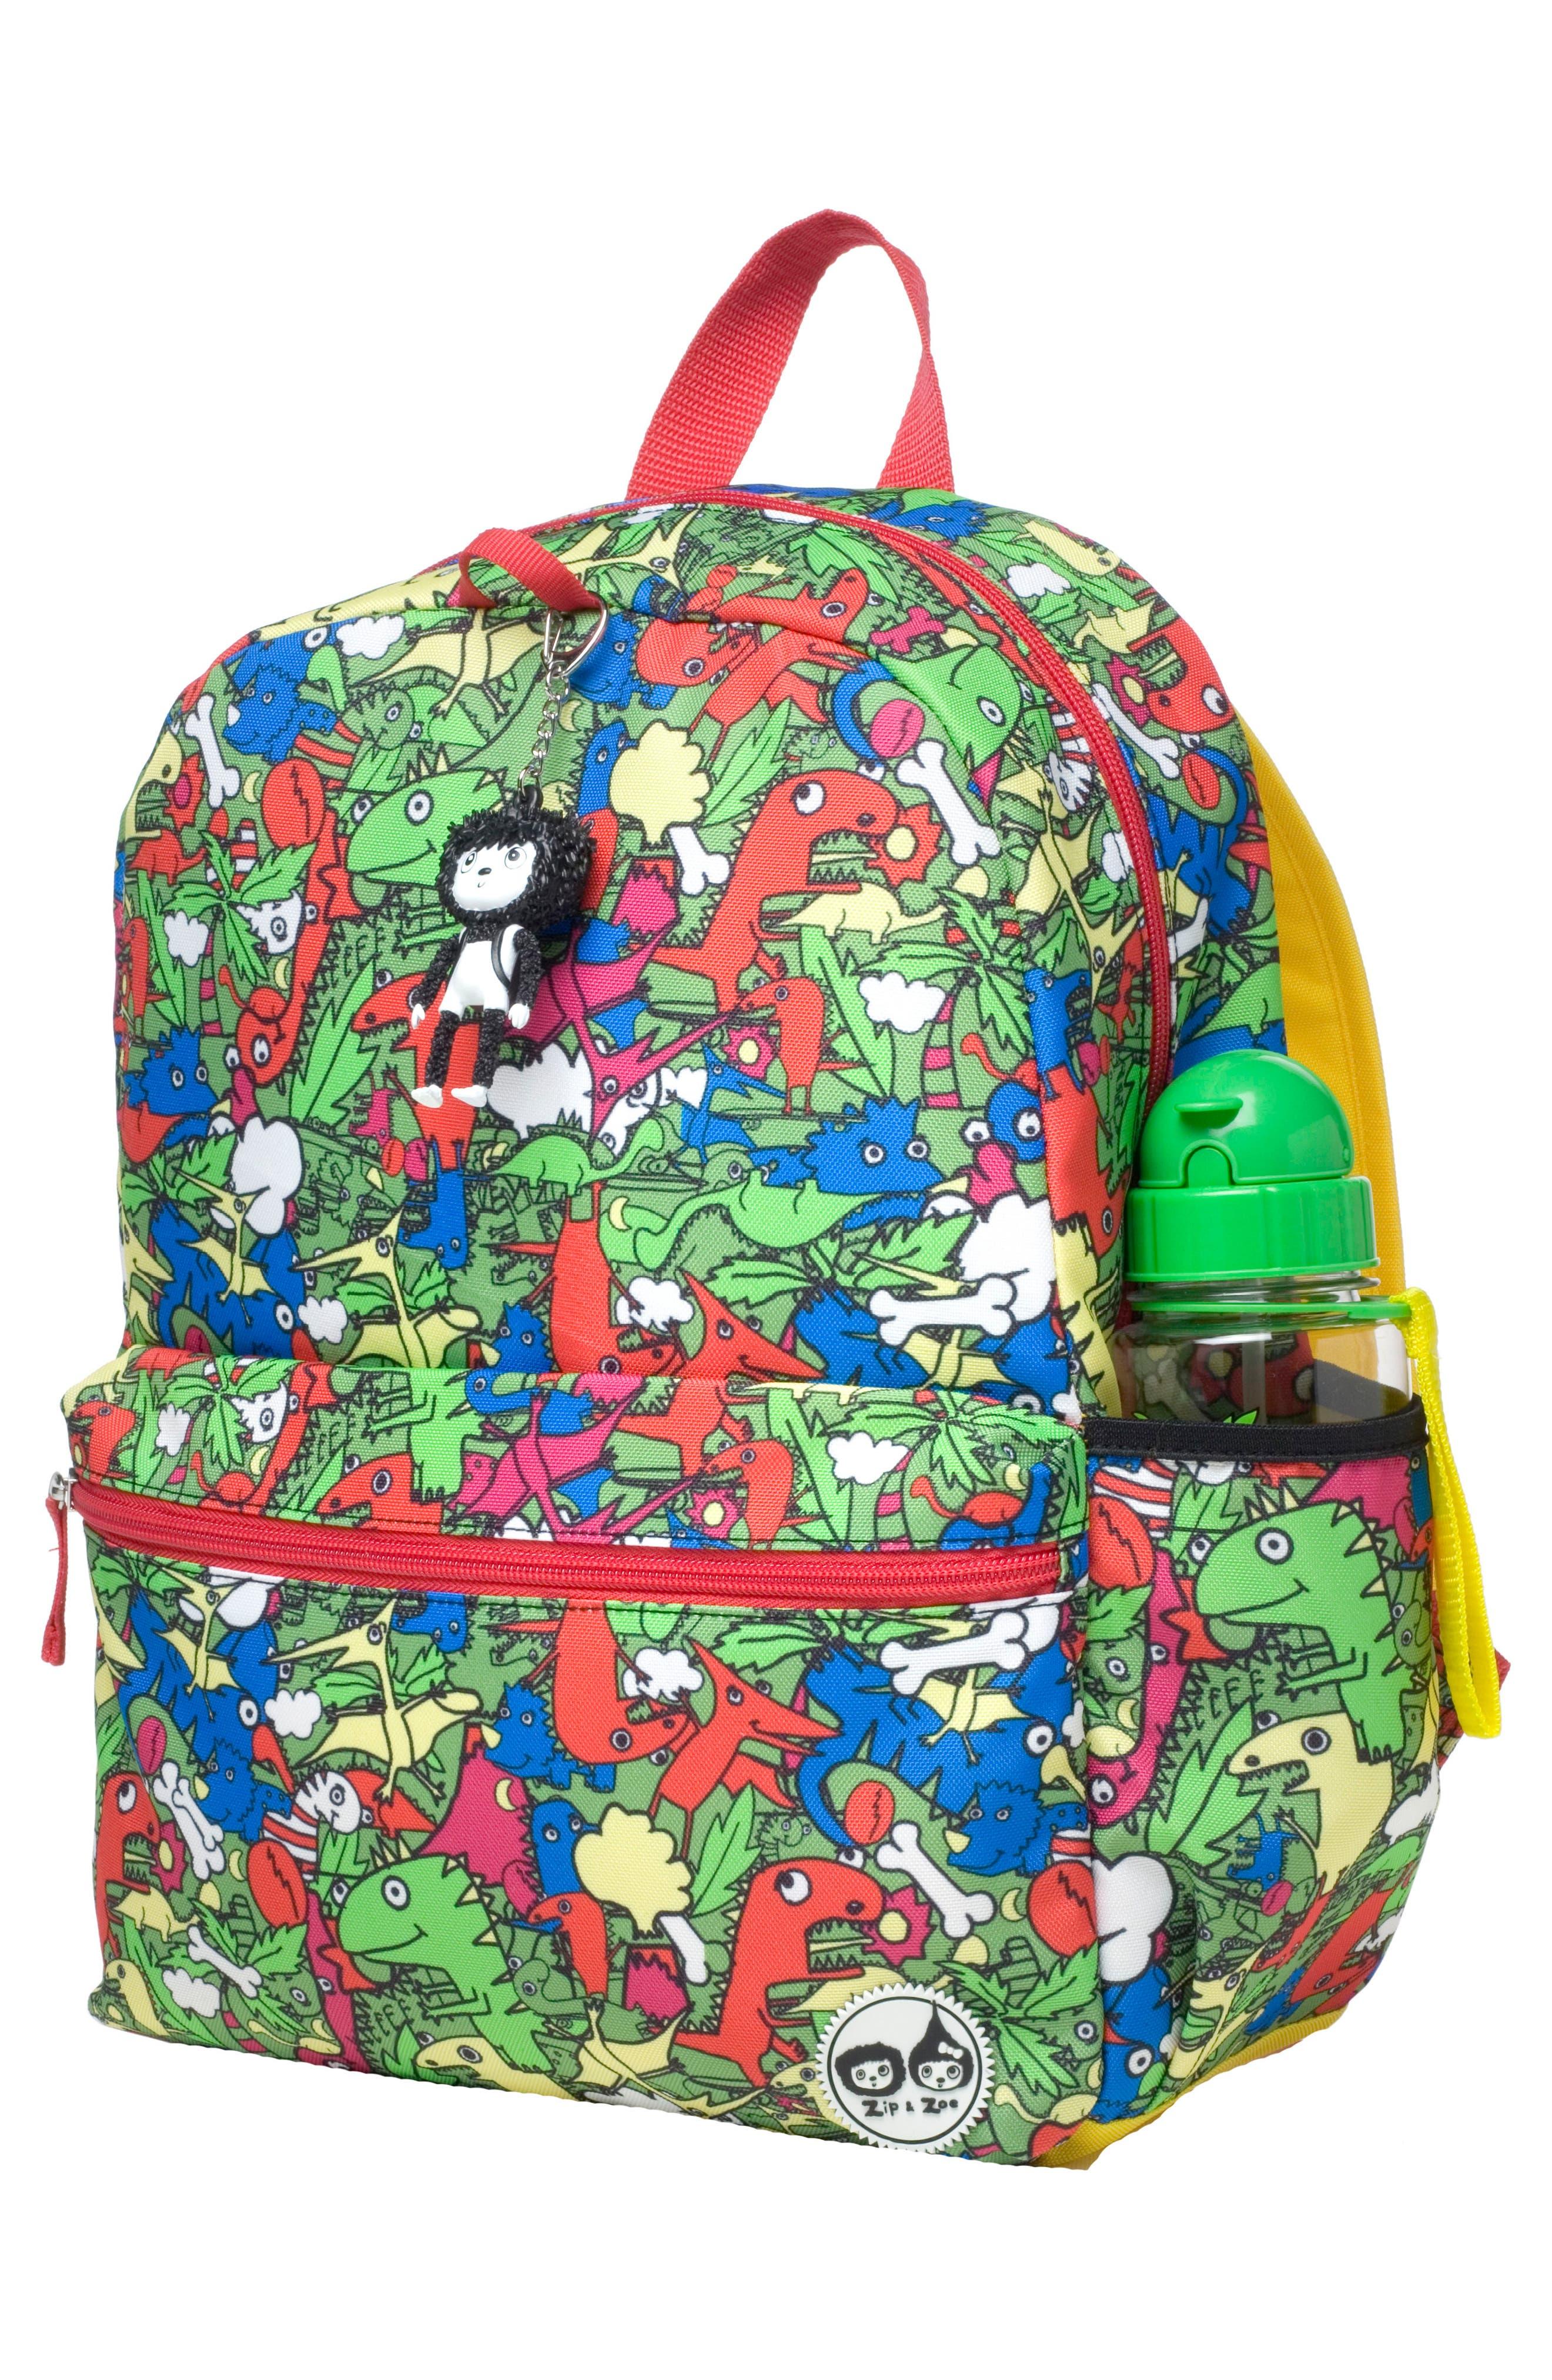 Zip & Zoe Dino Junior Backpack,                             Alternate thumbnail 4, color,                             DINO